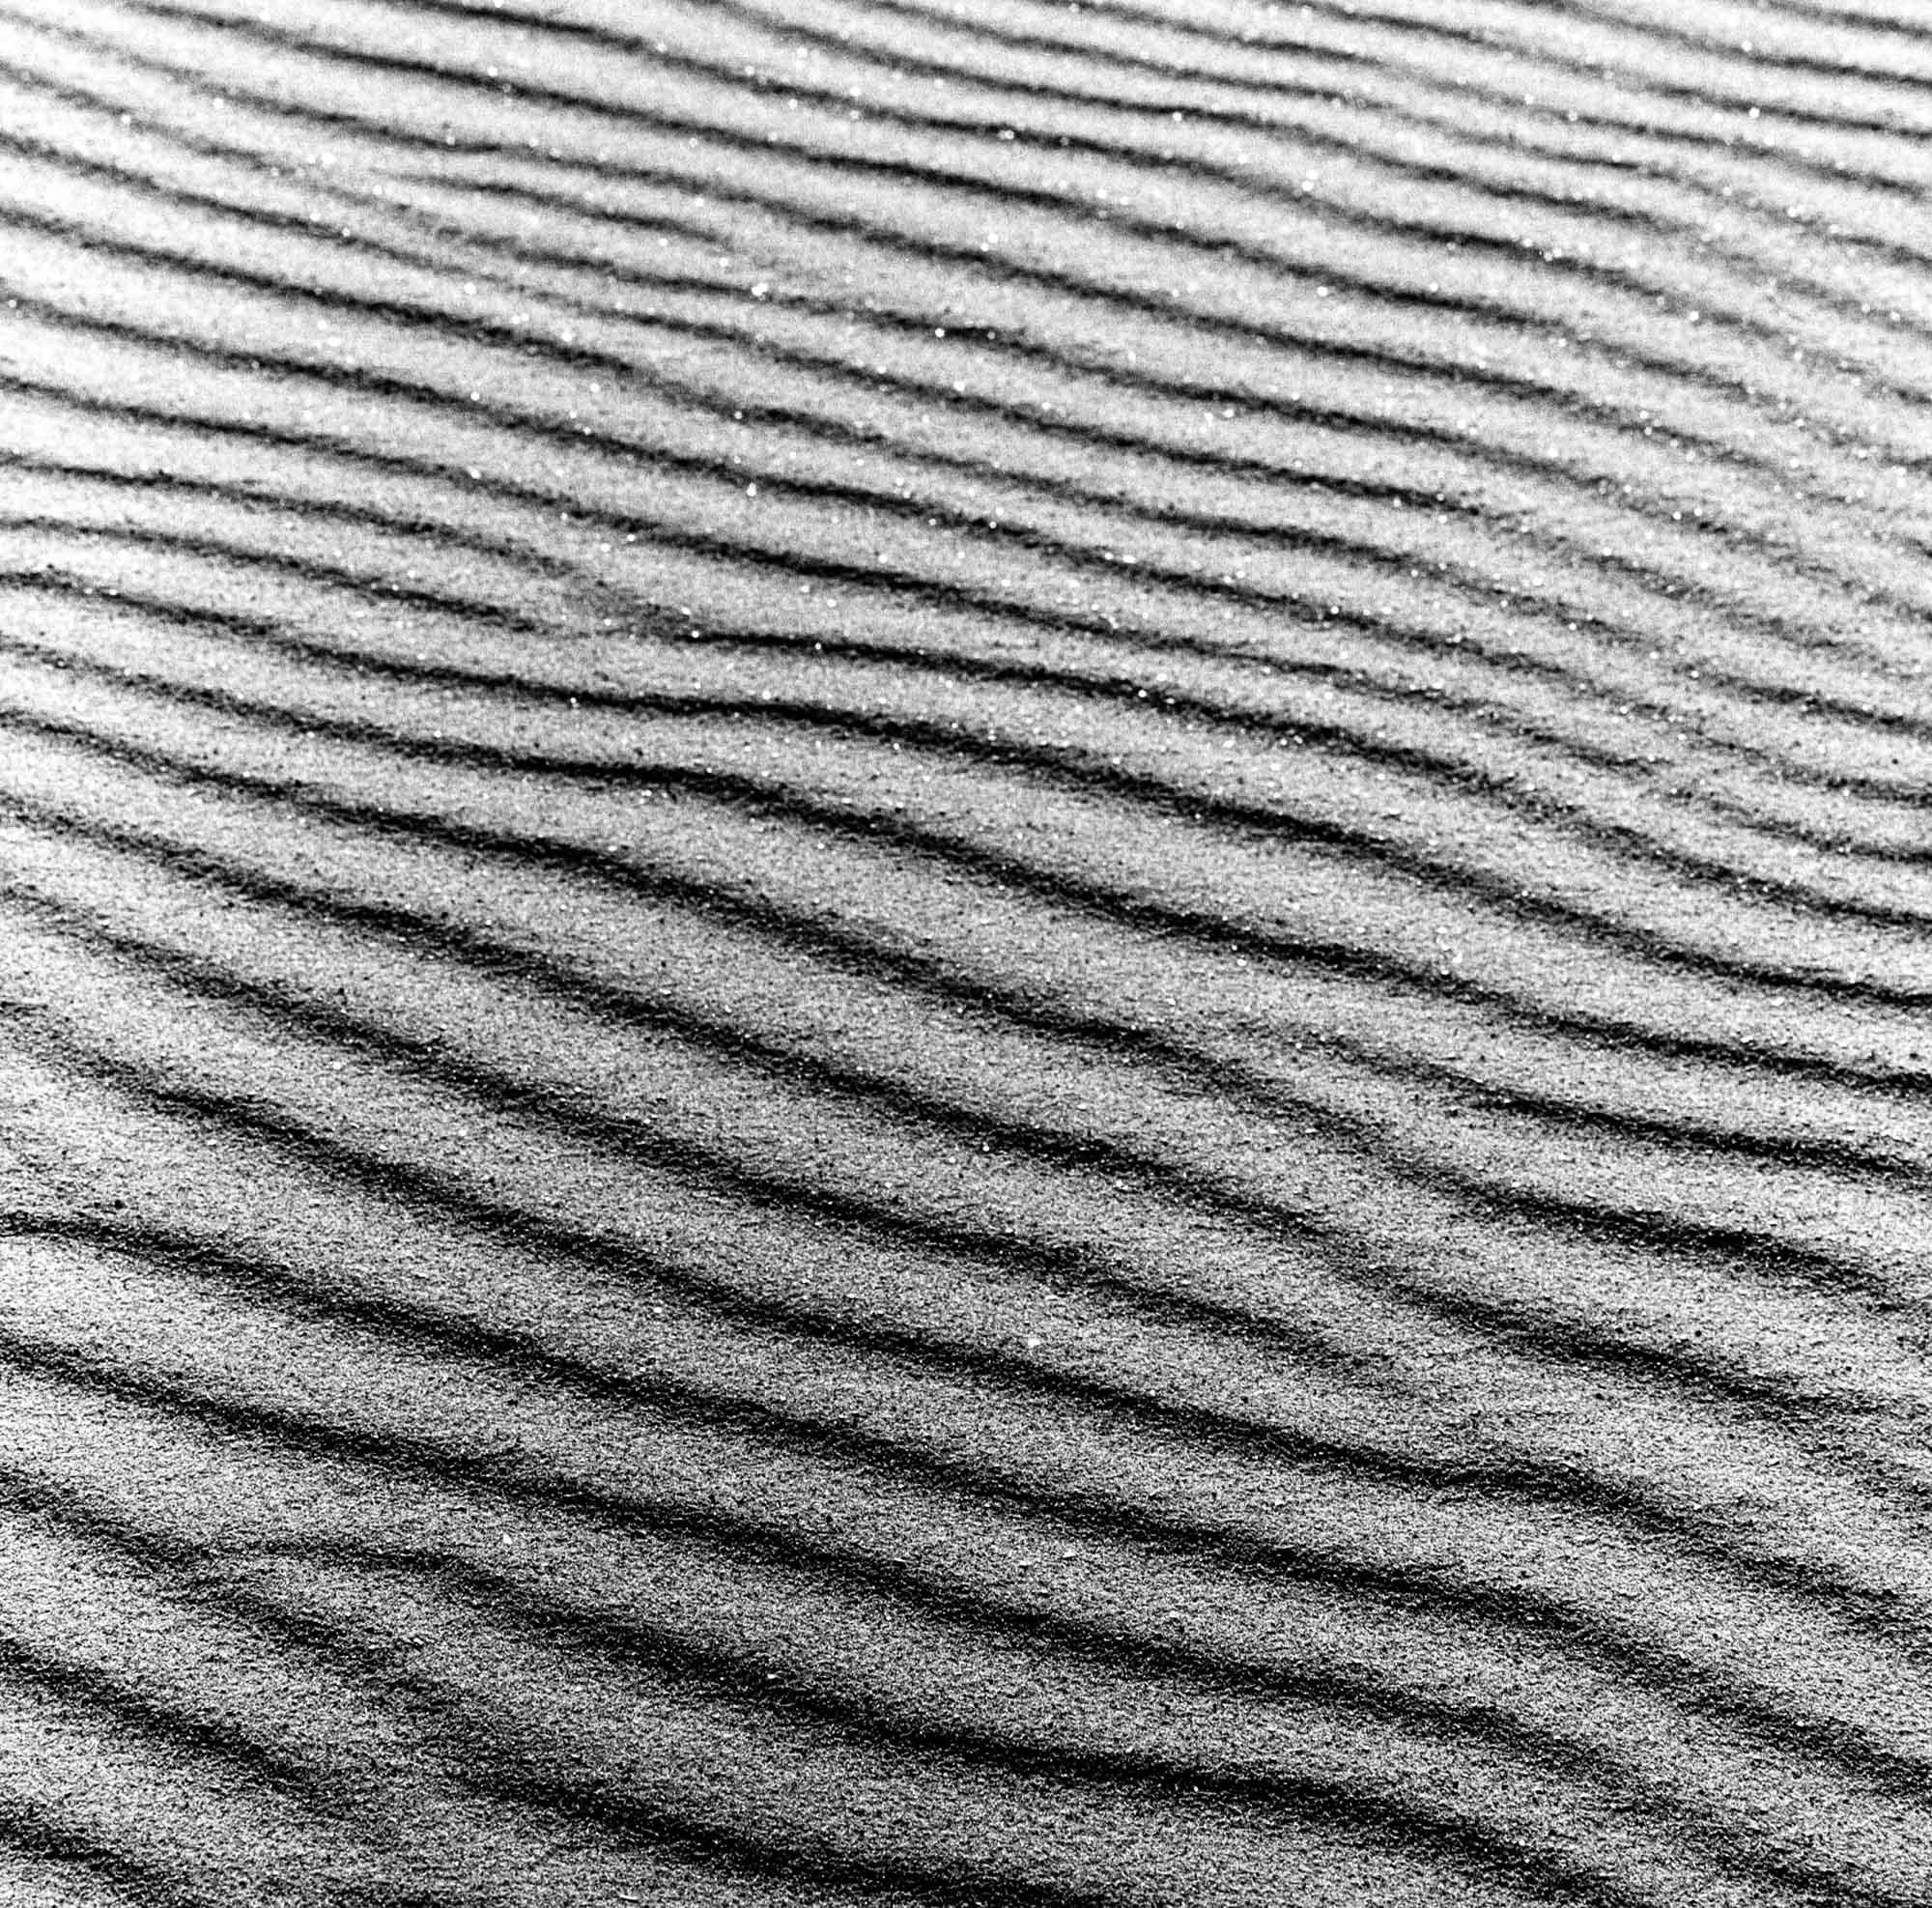 Rik_Groenland_14.jpg